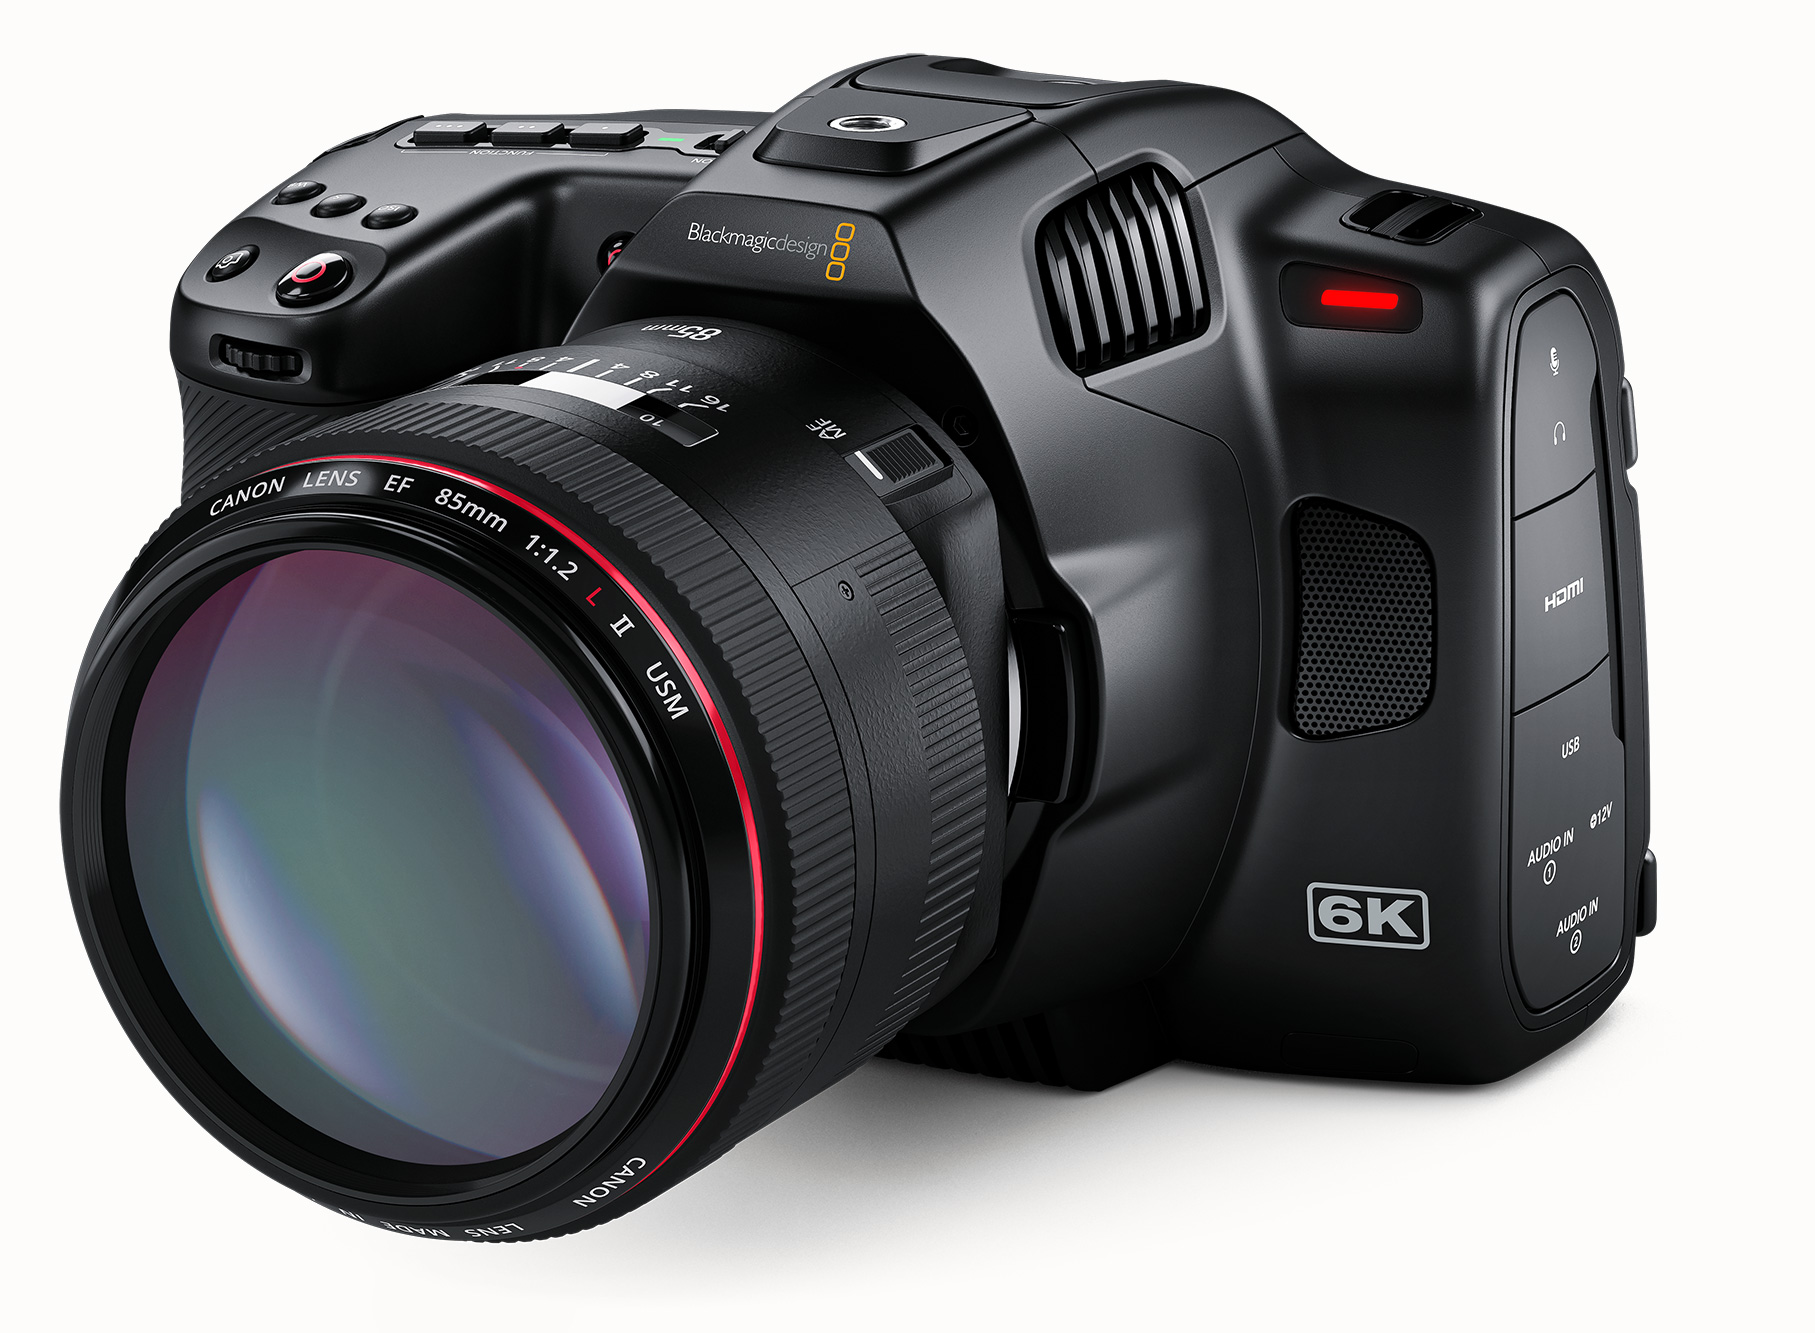 Blackmagic Camera 7.3 update brings numerous improvements